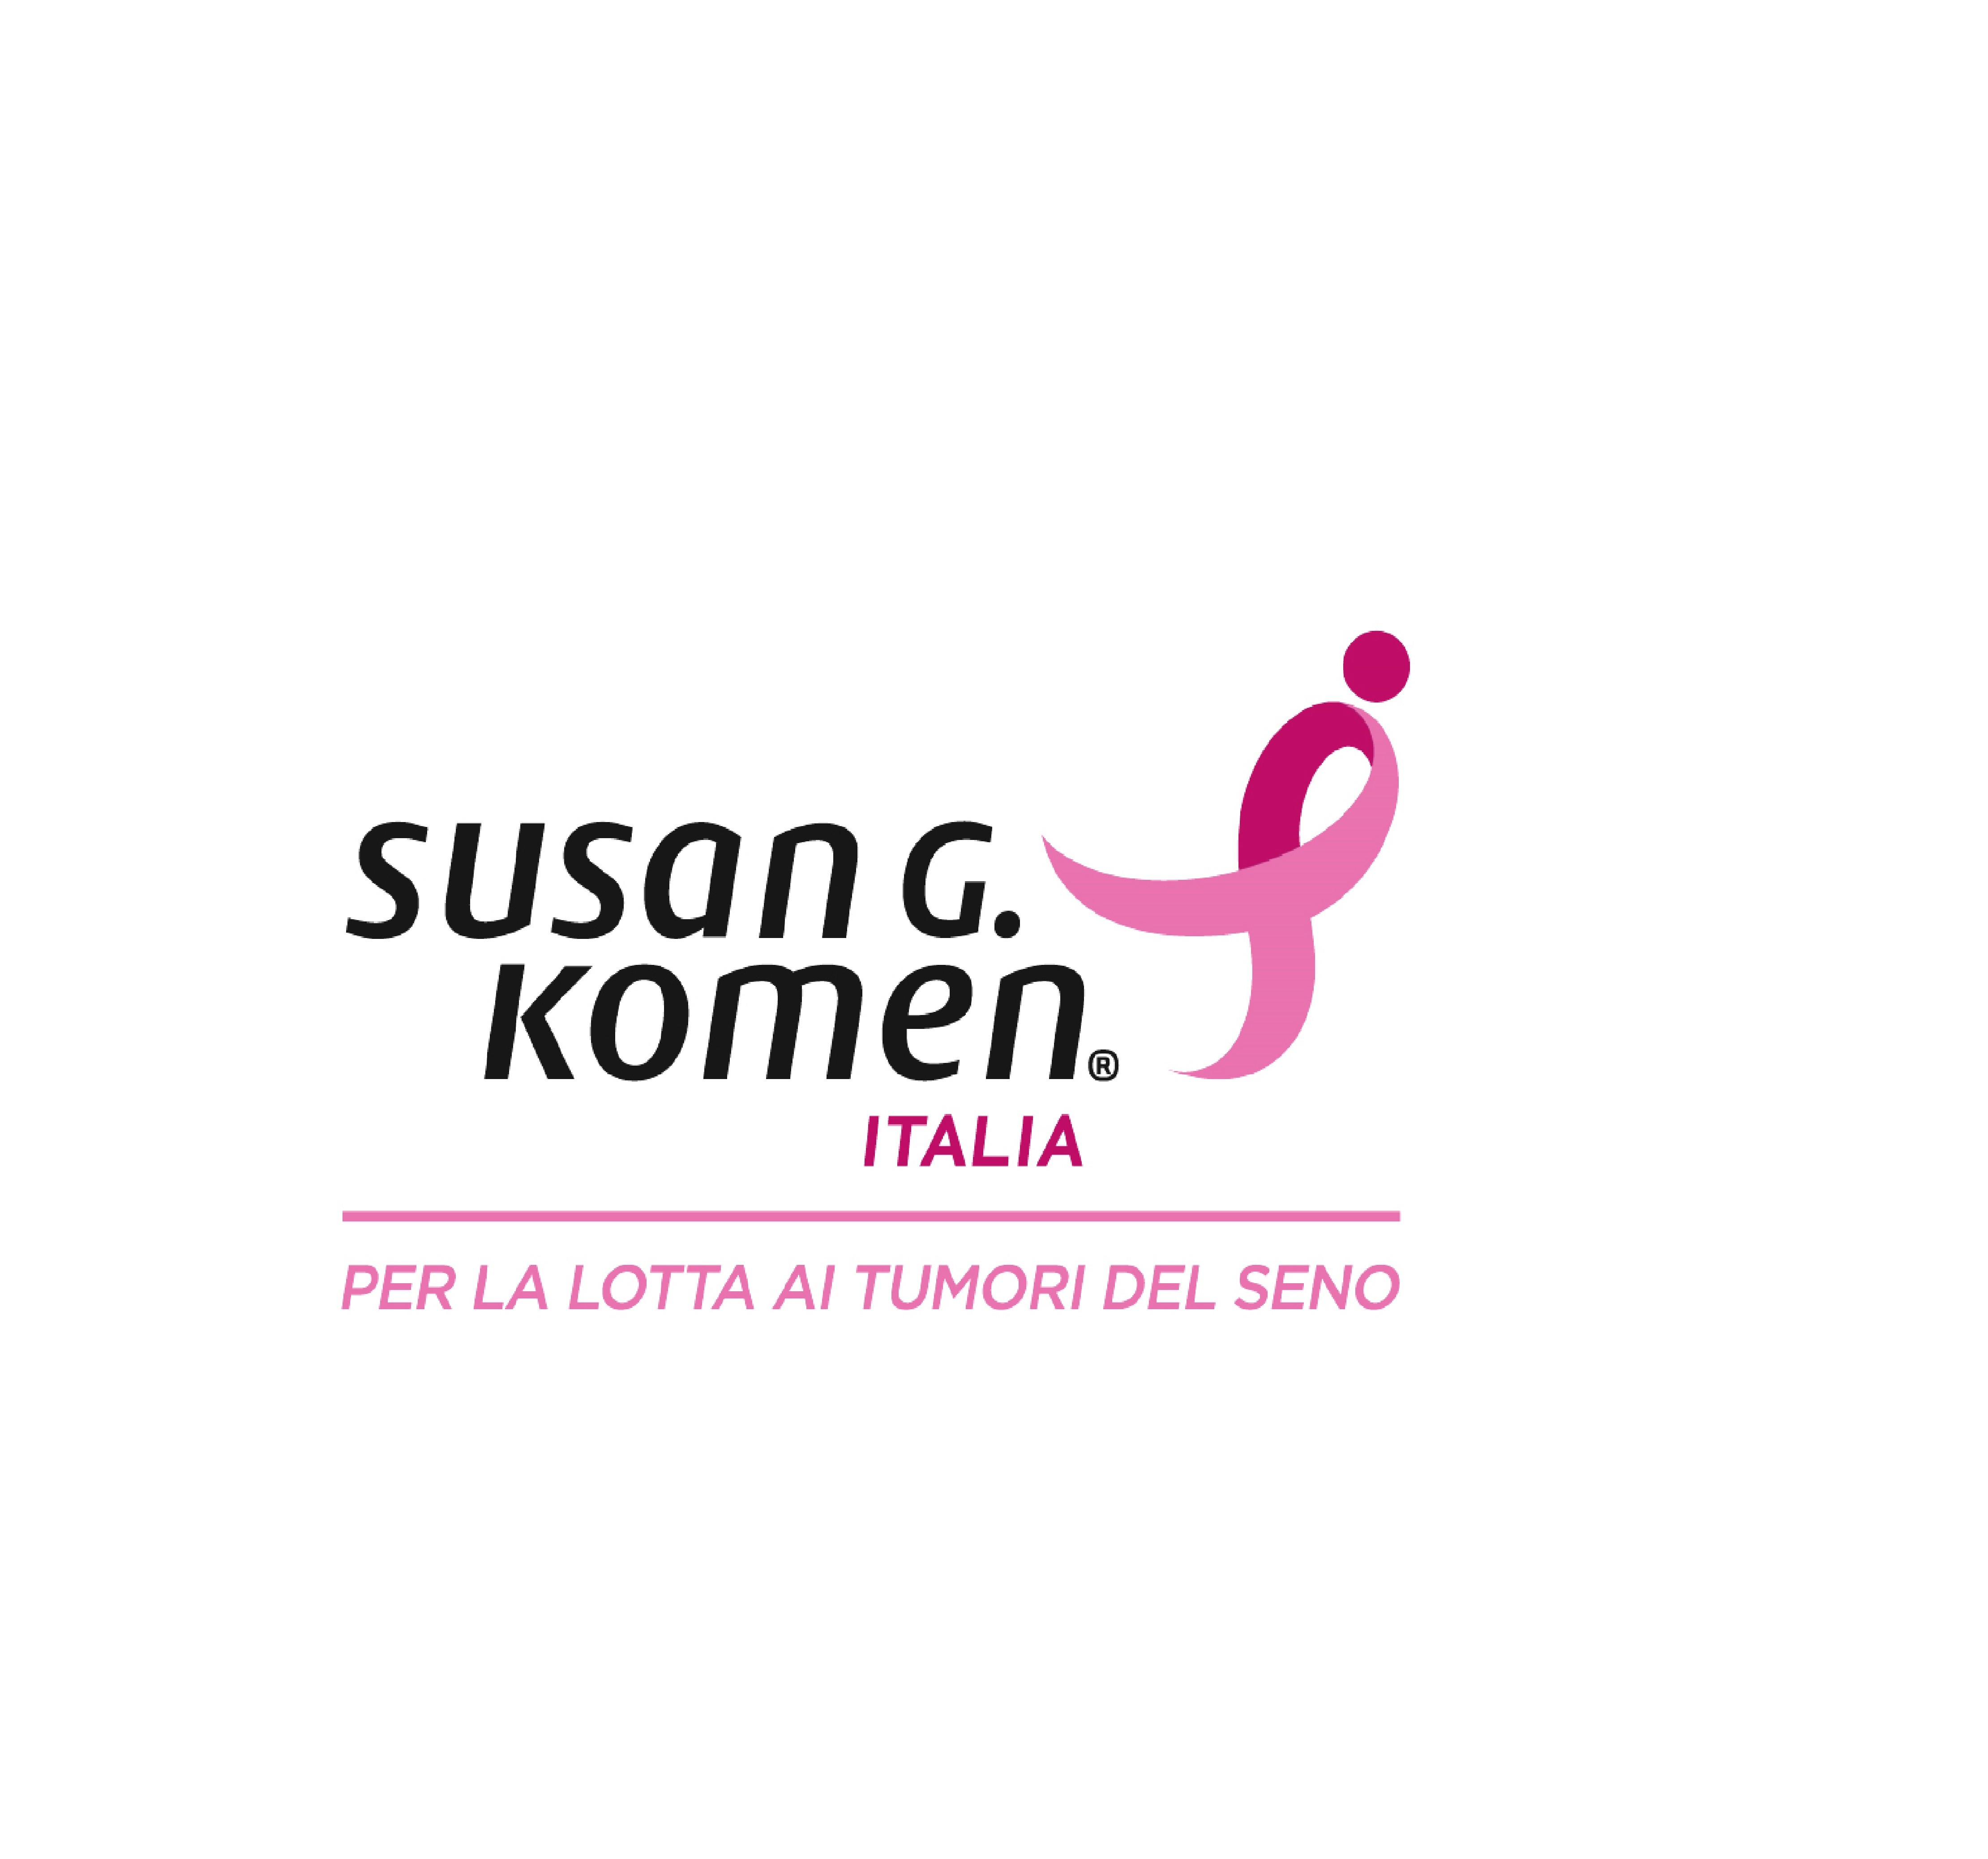 Susan G. Komen Italia